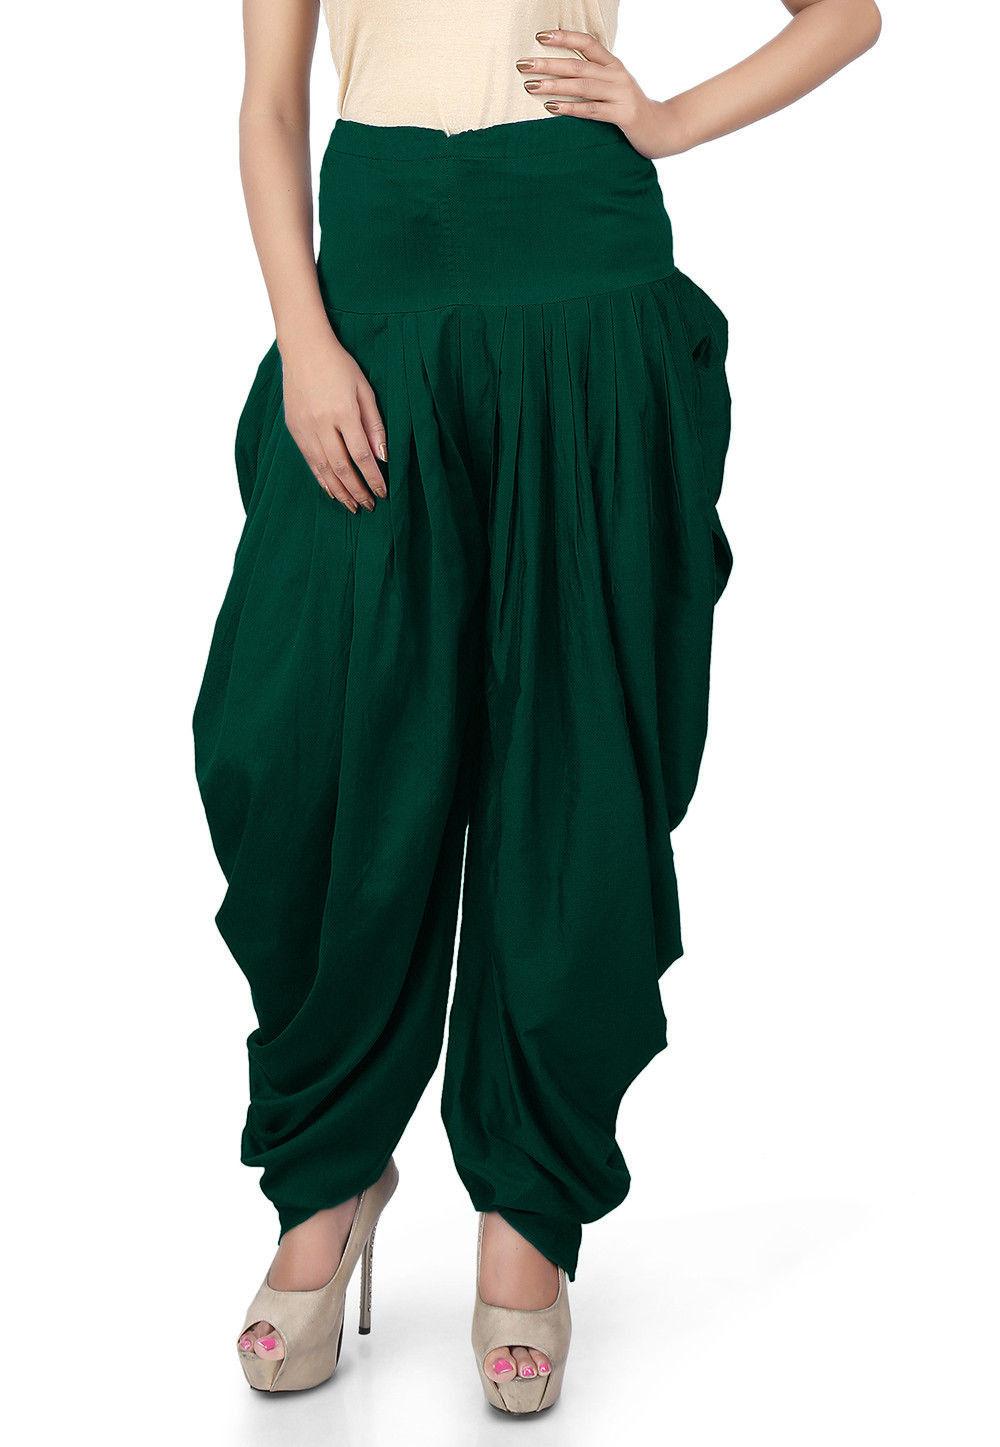 Solid Color Cotton Silk Salwars in Dark Green